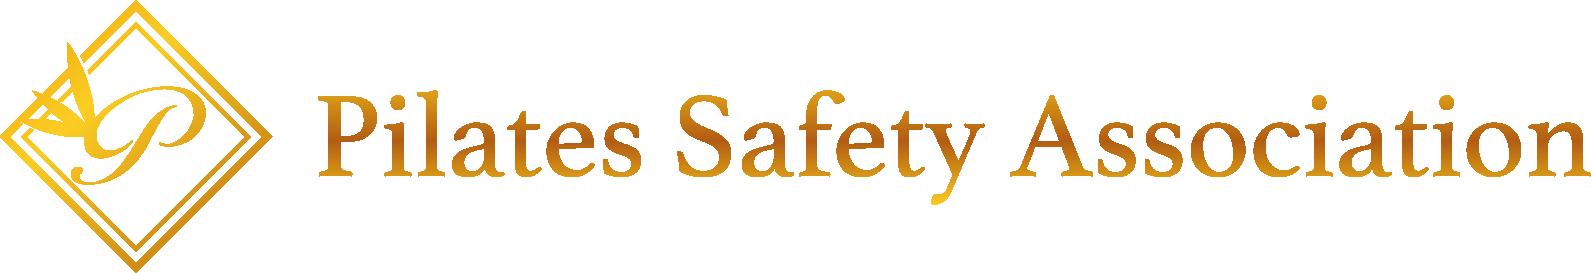 Pilates Safety Association